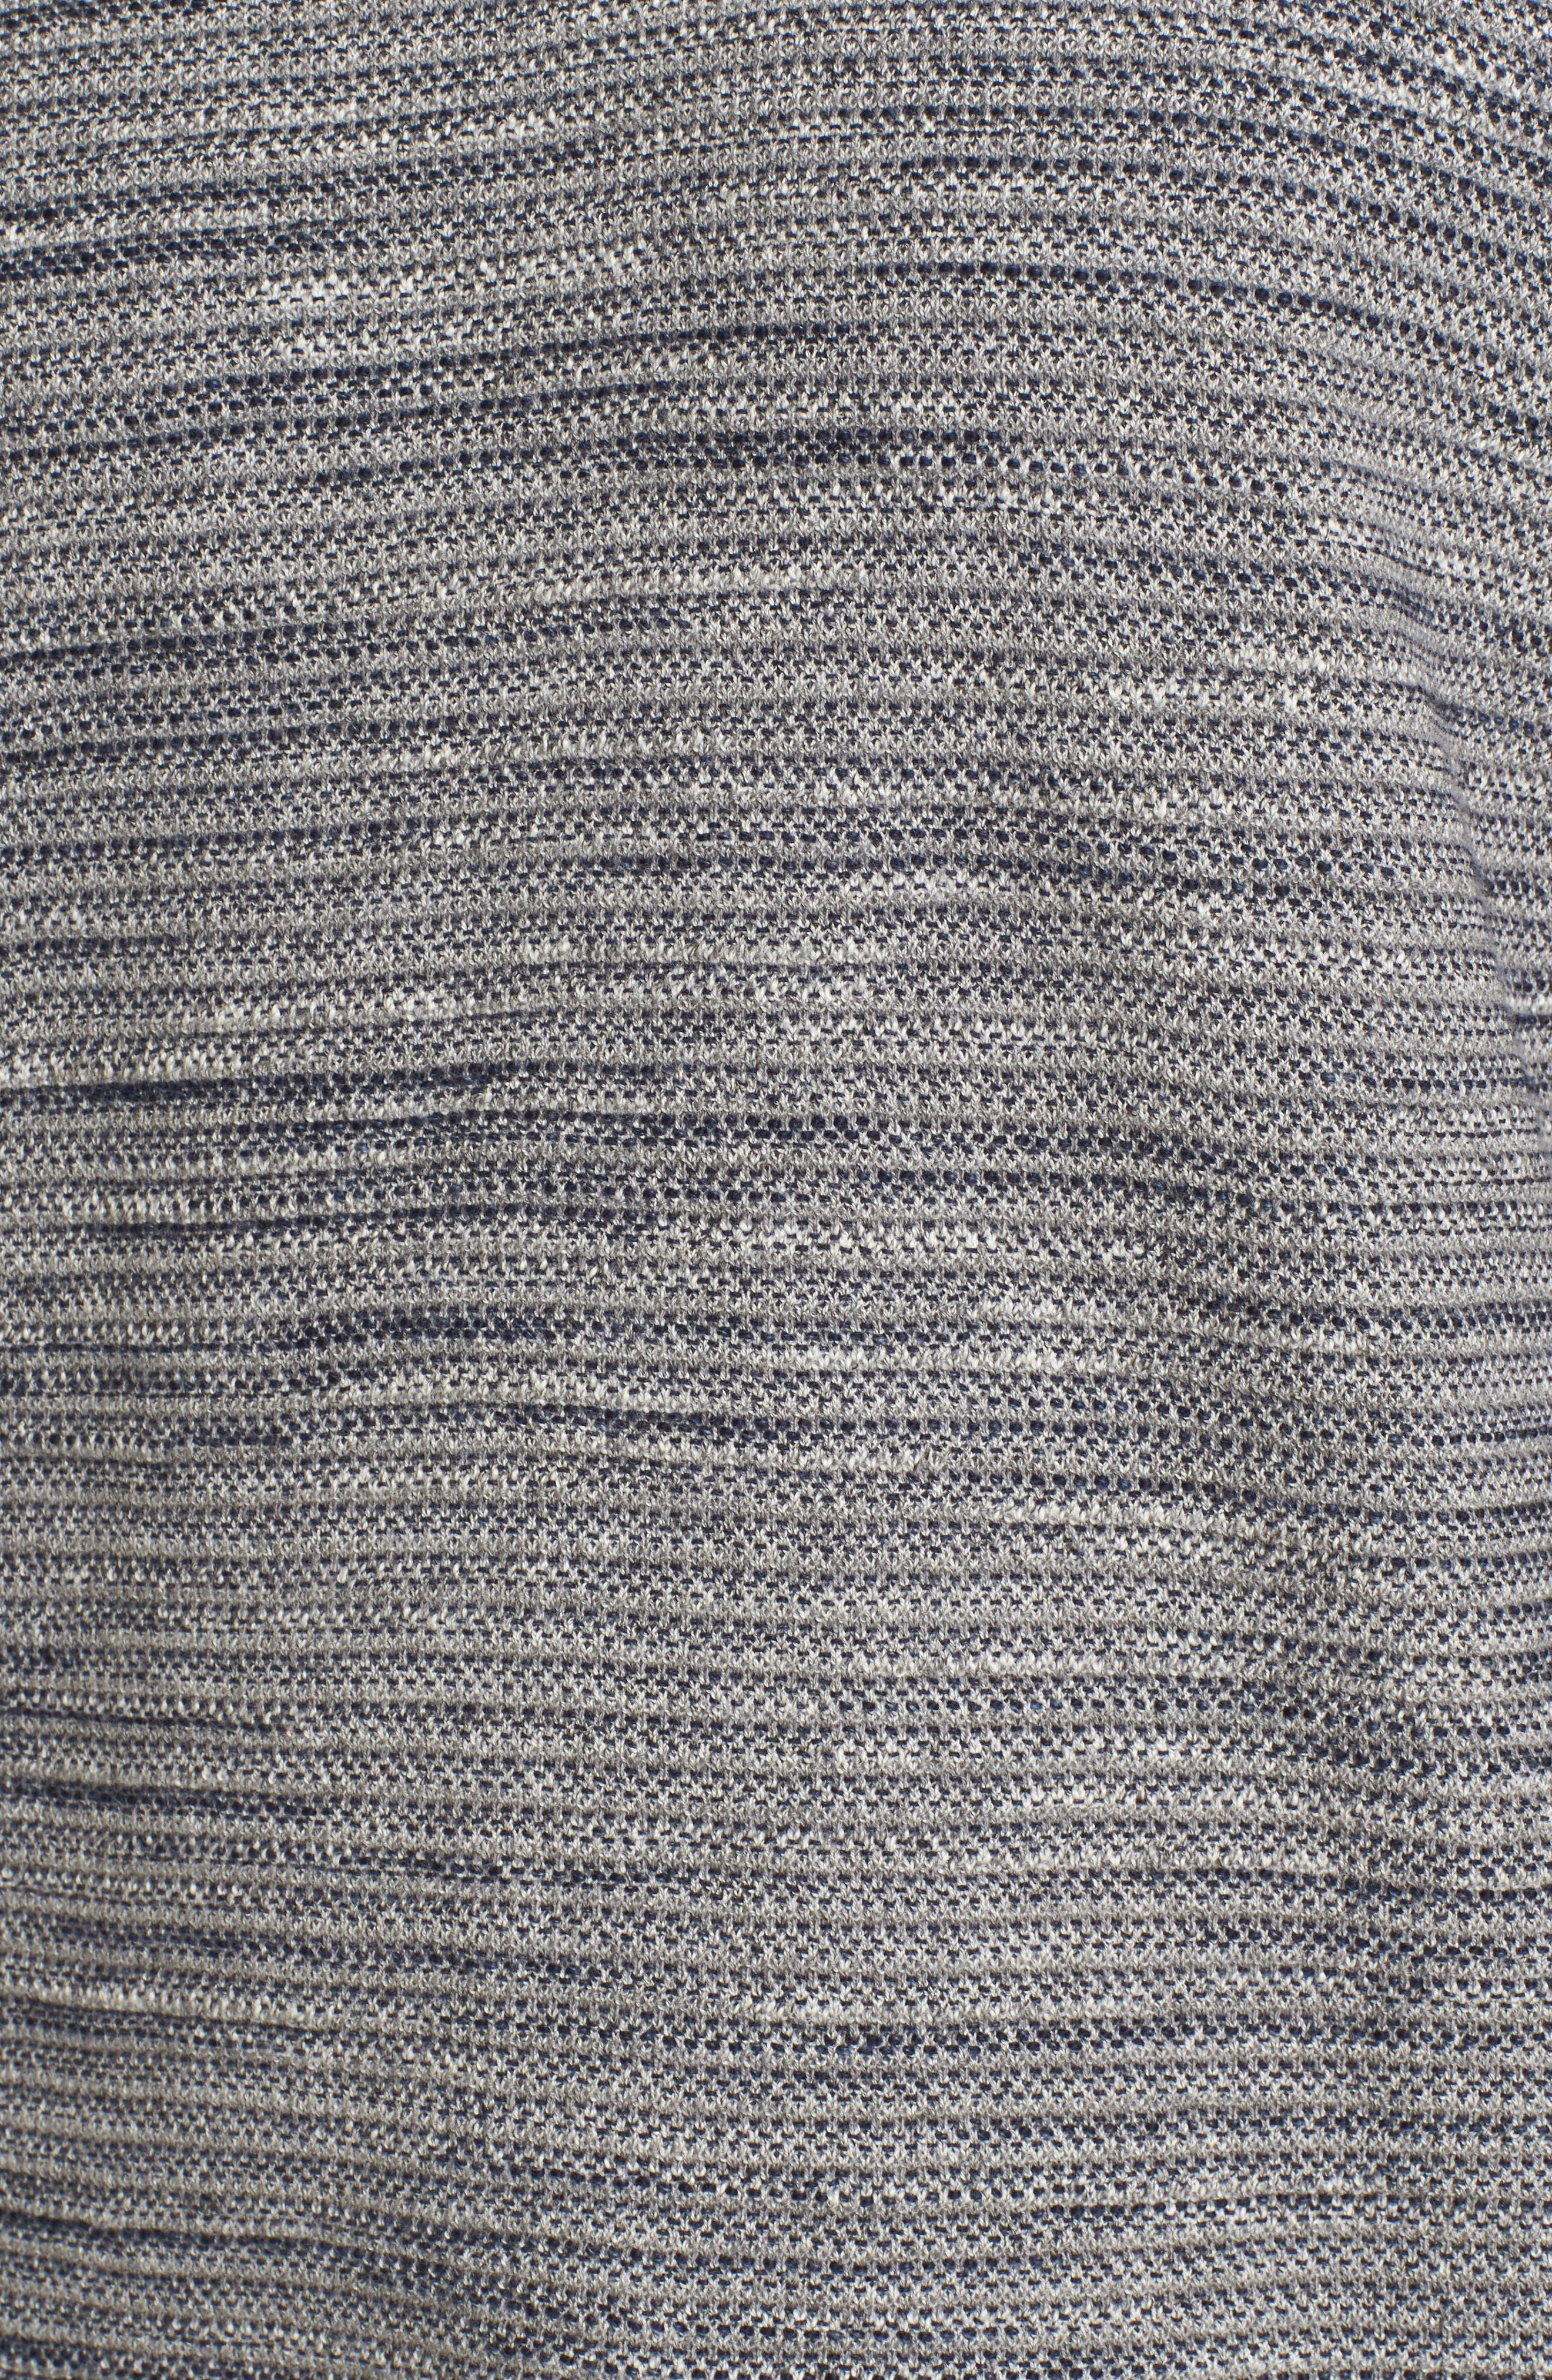 Alternate Image 5  - Grayers Bird's Eye Cotton Jacquard Sweater